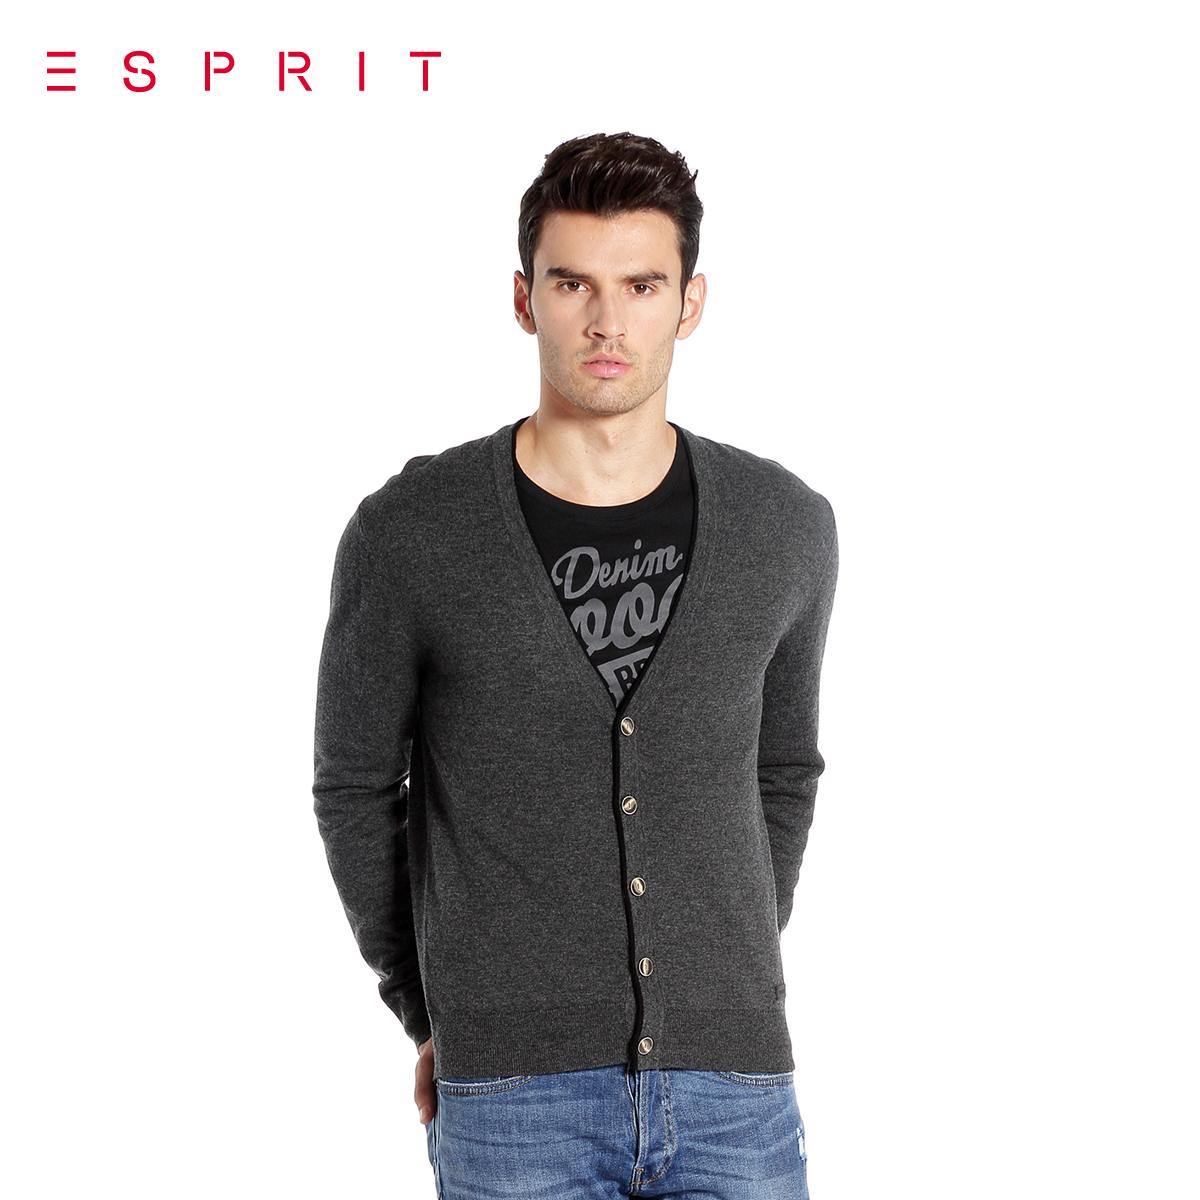 Свитер мужской Esprit iwd0305 -IWD0305O 599 футболка esprit 124eo1k0 124eo1k024c 399